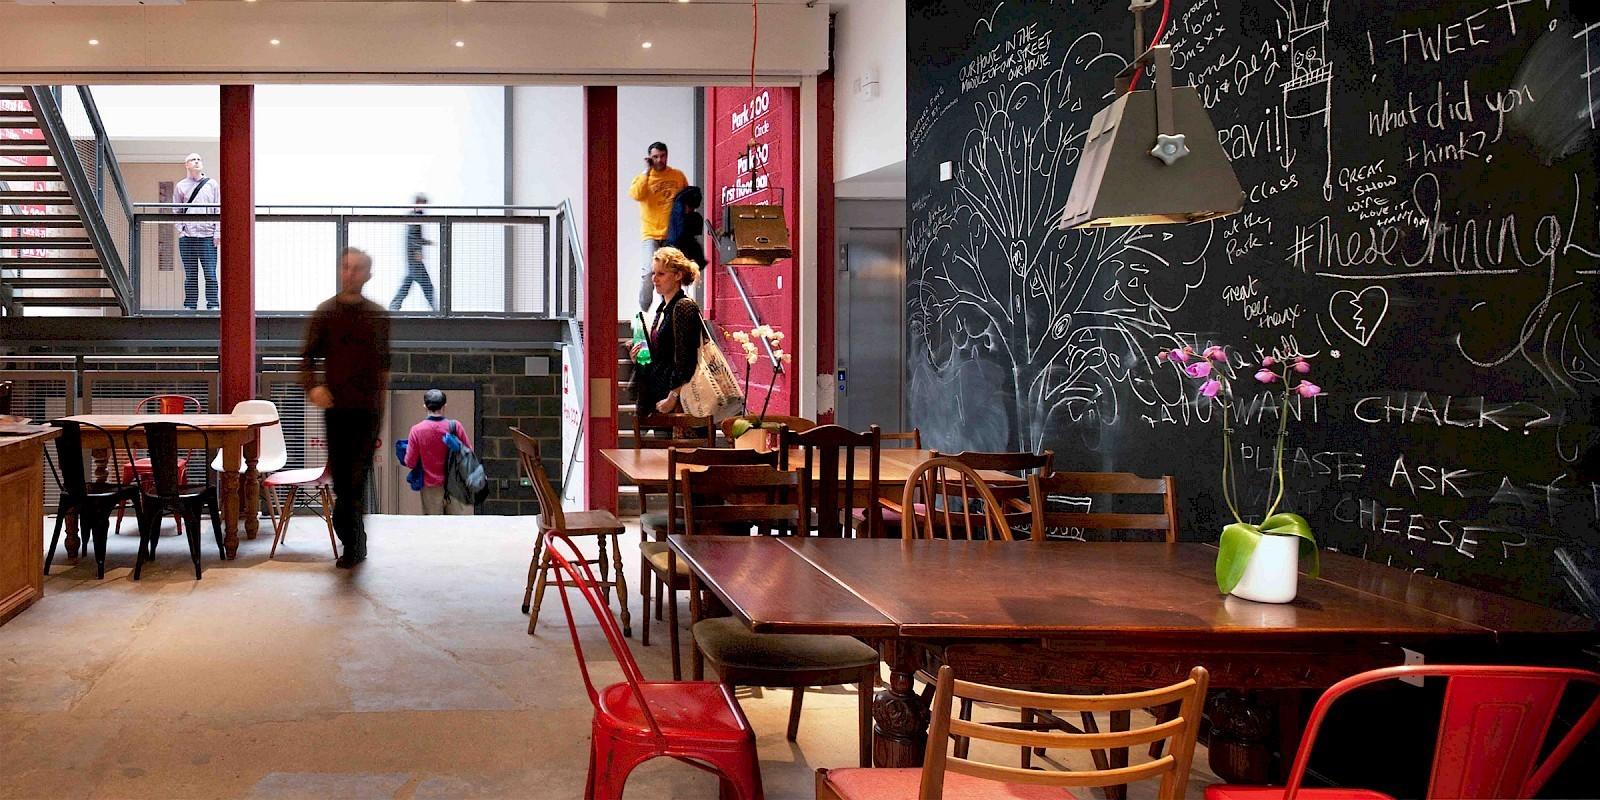 PARK THEATRE CAFE BAR, FINSBURY PARK - Sheet3